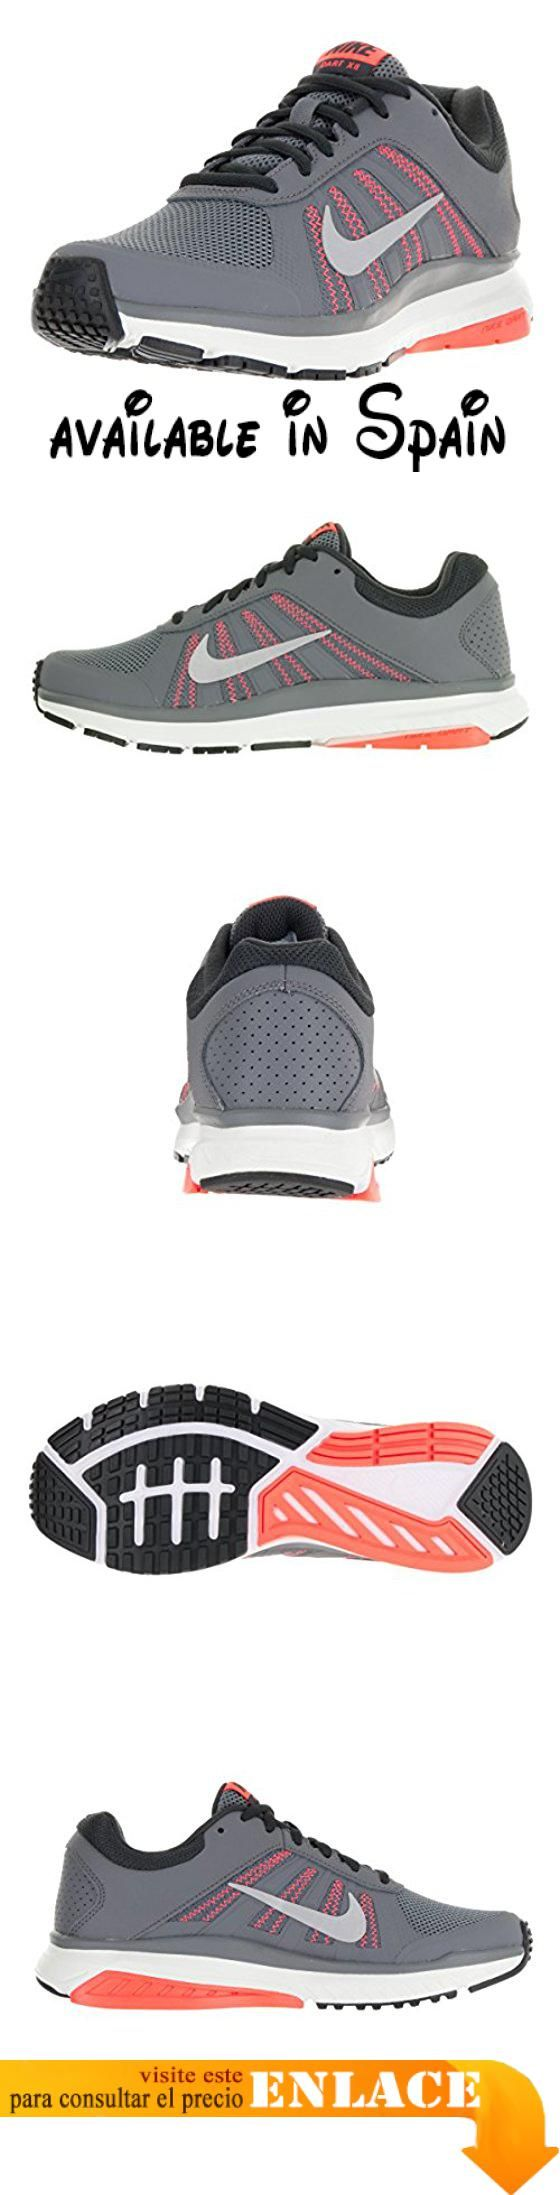 B019ER9IIO : Nike Mujer dardos 12Zapatilla de Running. #Zapatos #SHOES